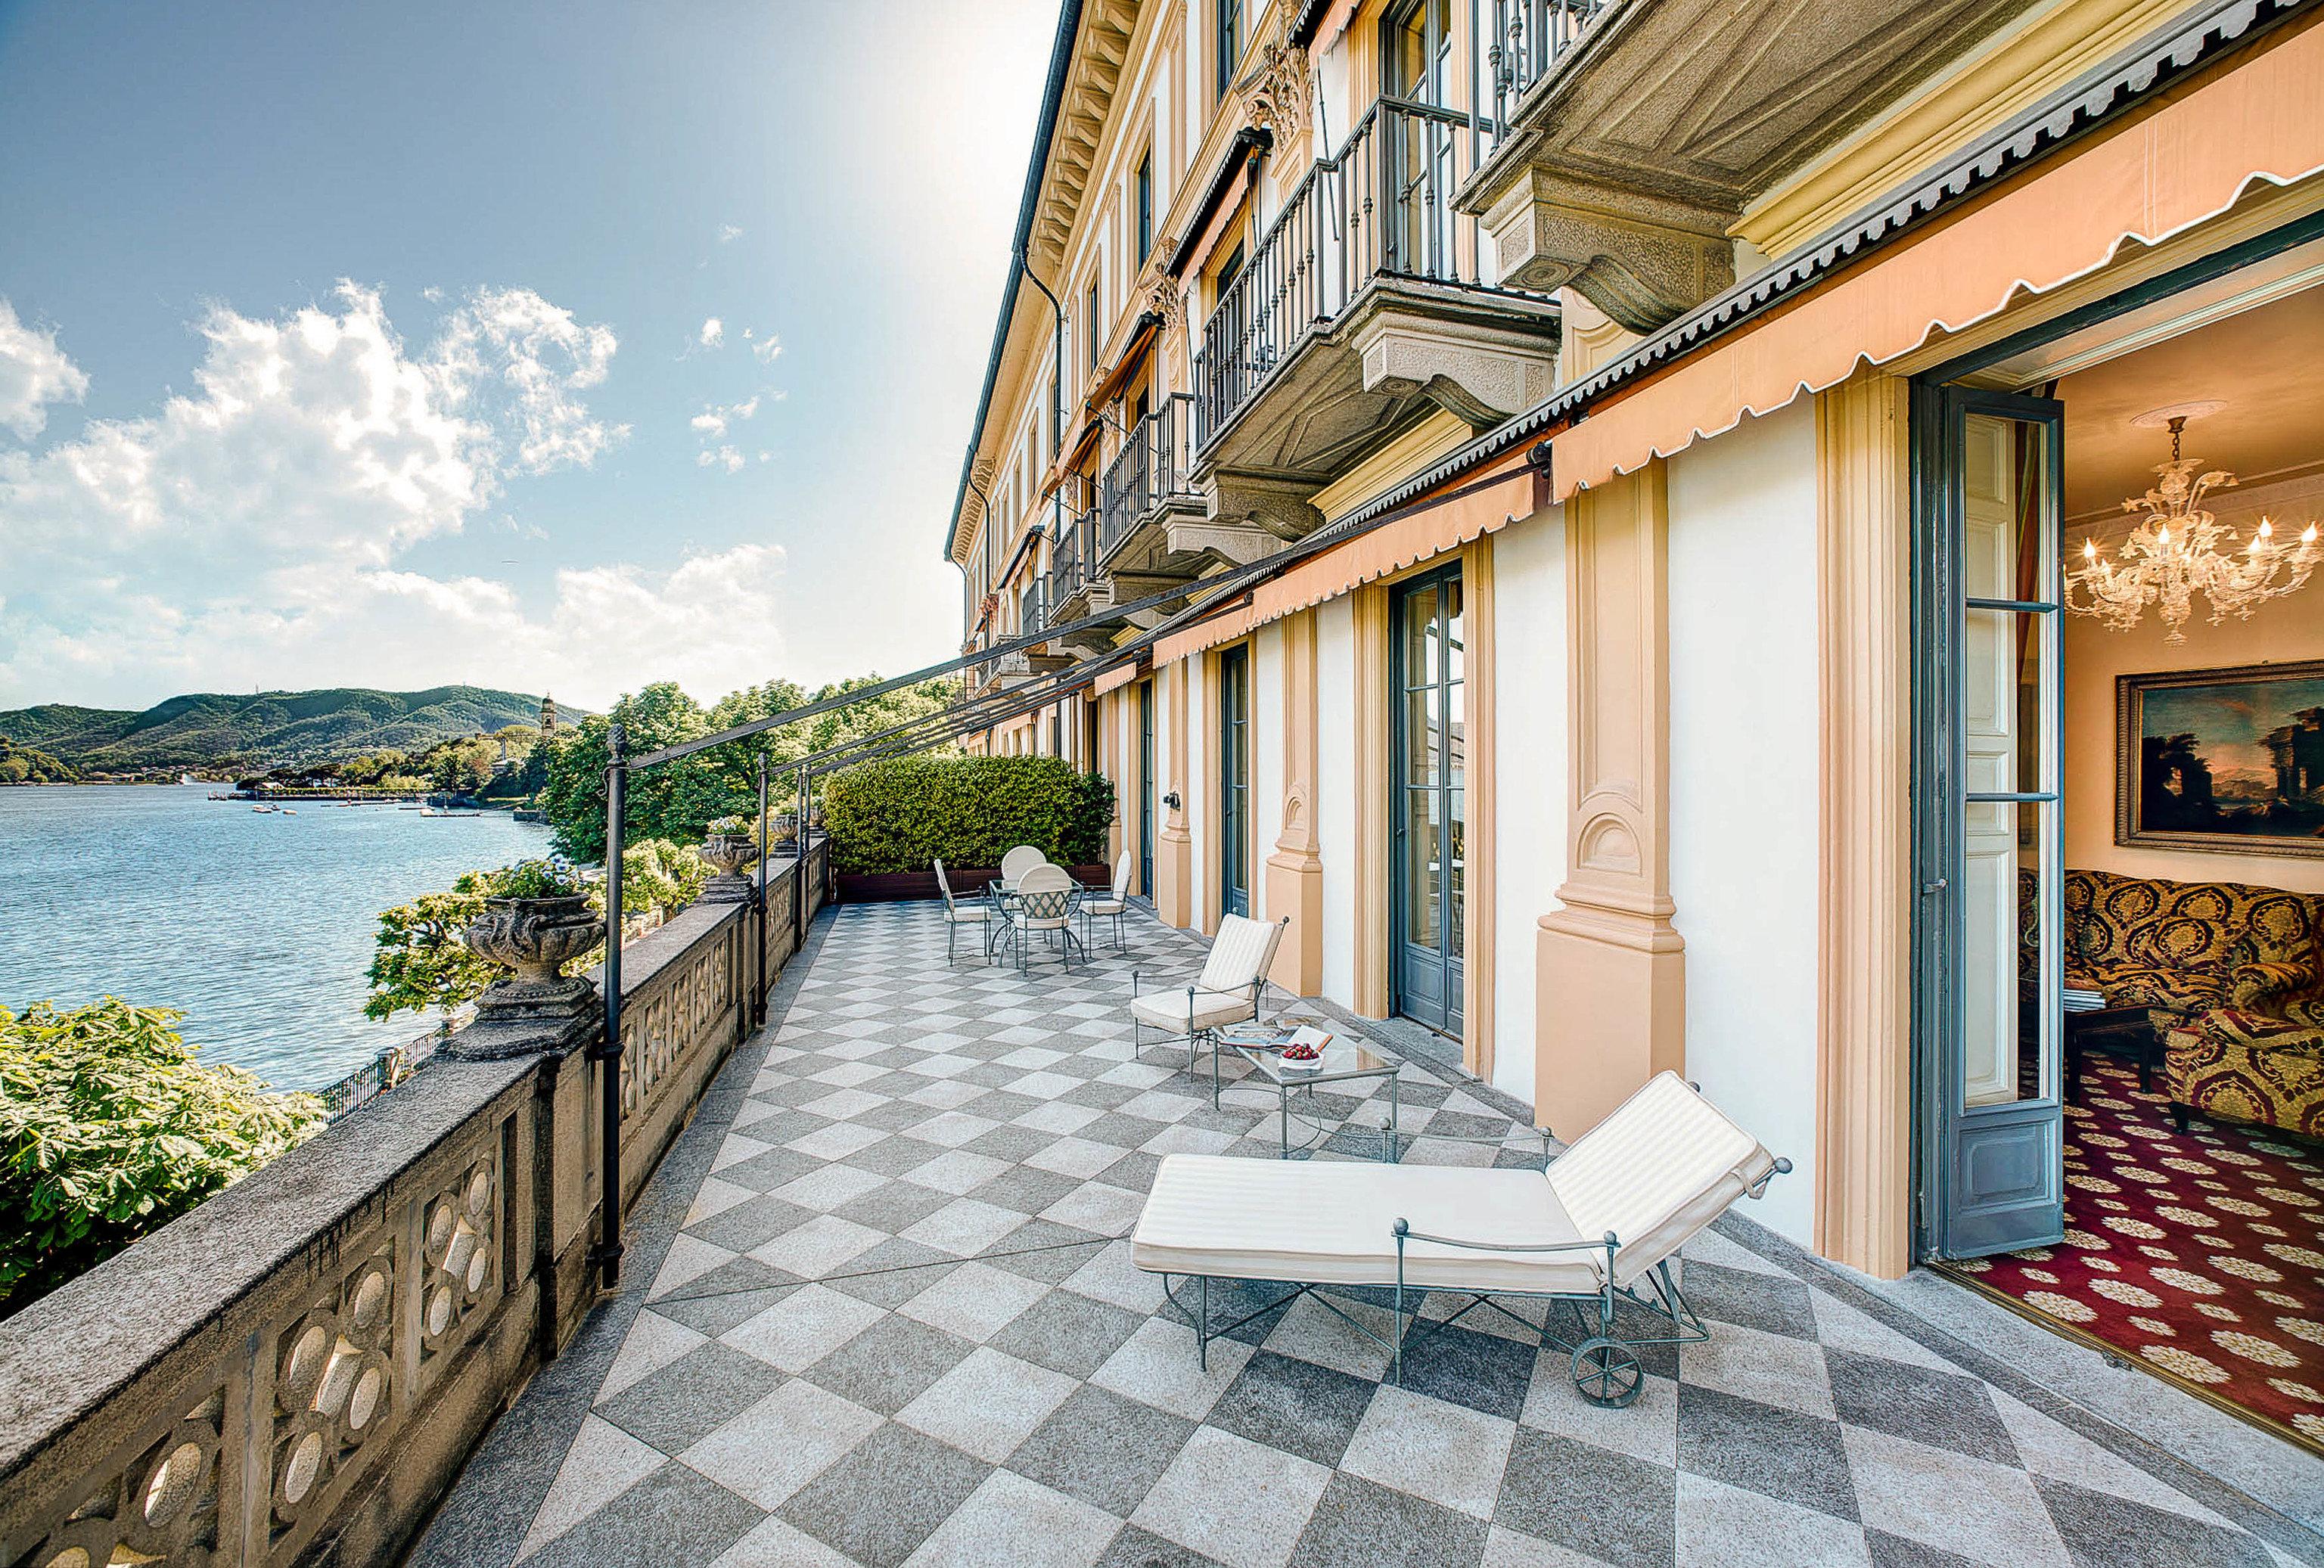 europe Trip Ideas property real estate home Balcony estate apartment building sky Villa outdoor structure condominium facade house walkway